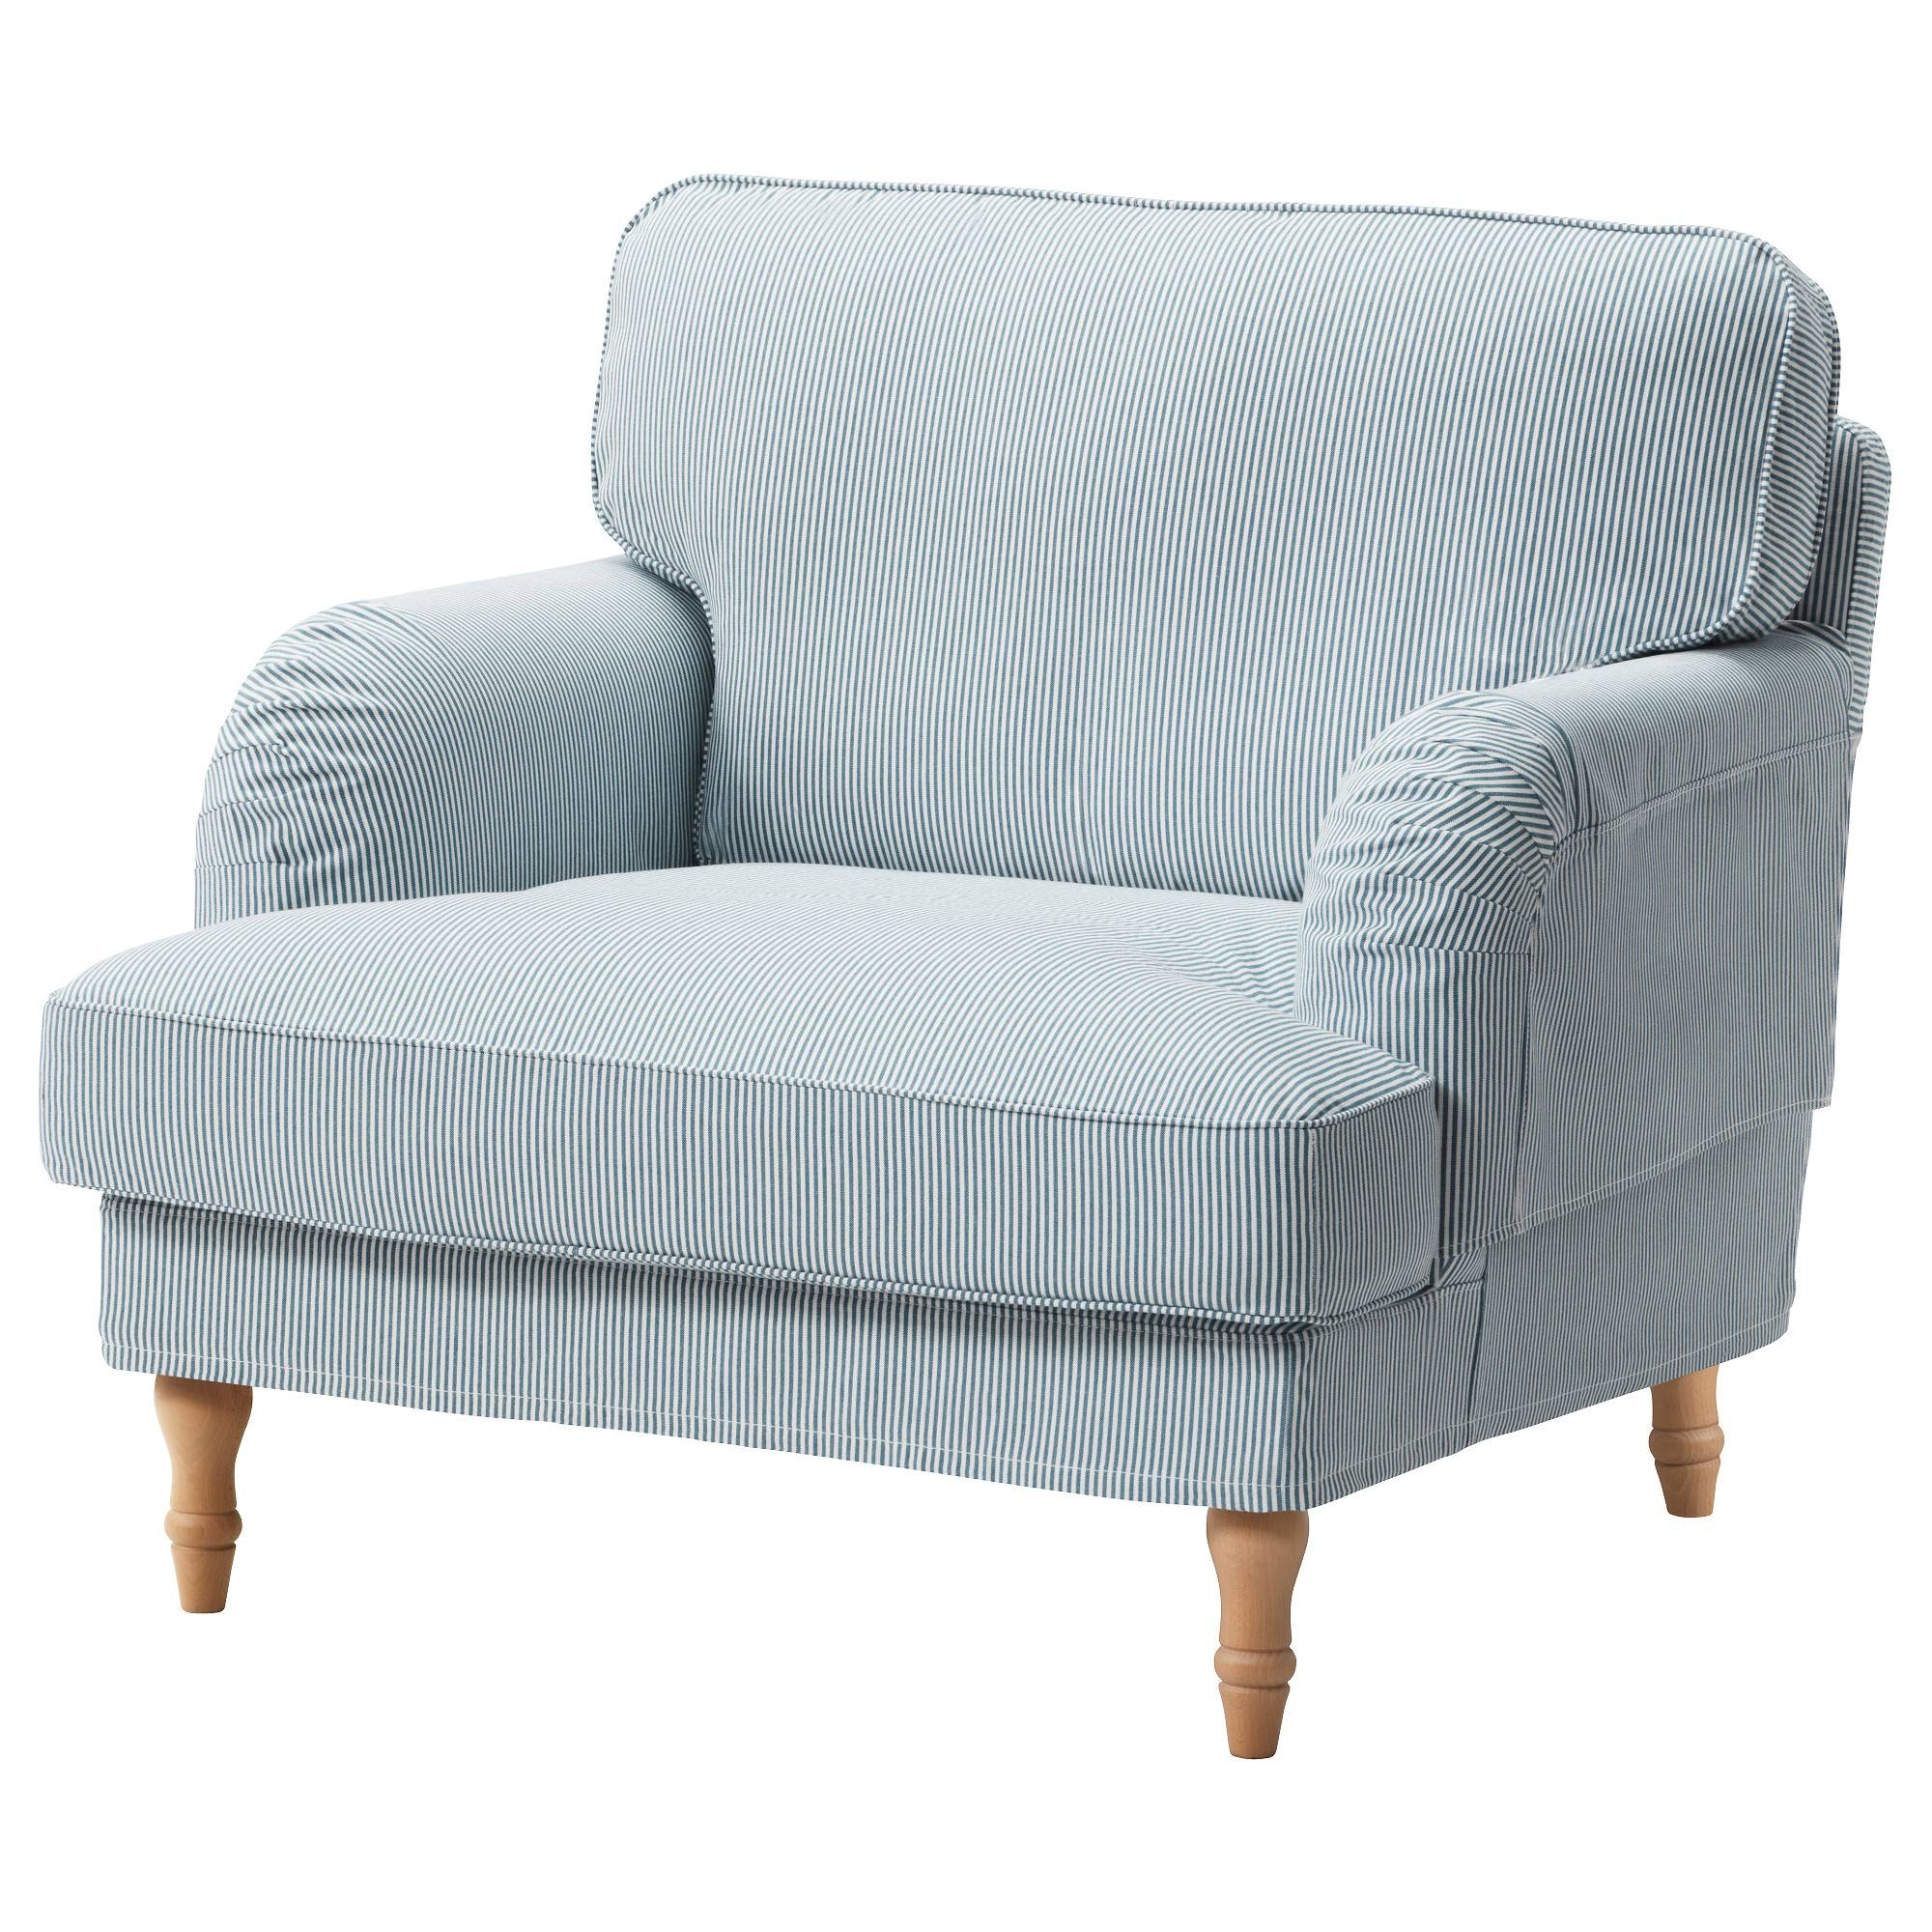 Stocksund Series - Ikea regarding Wide Sofa Chairs (Image 15 of 15)